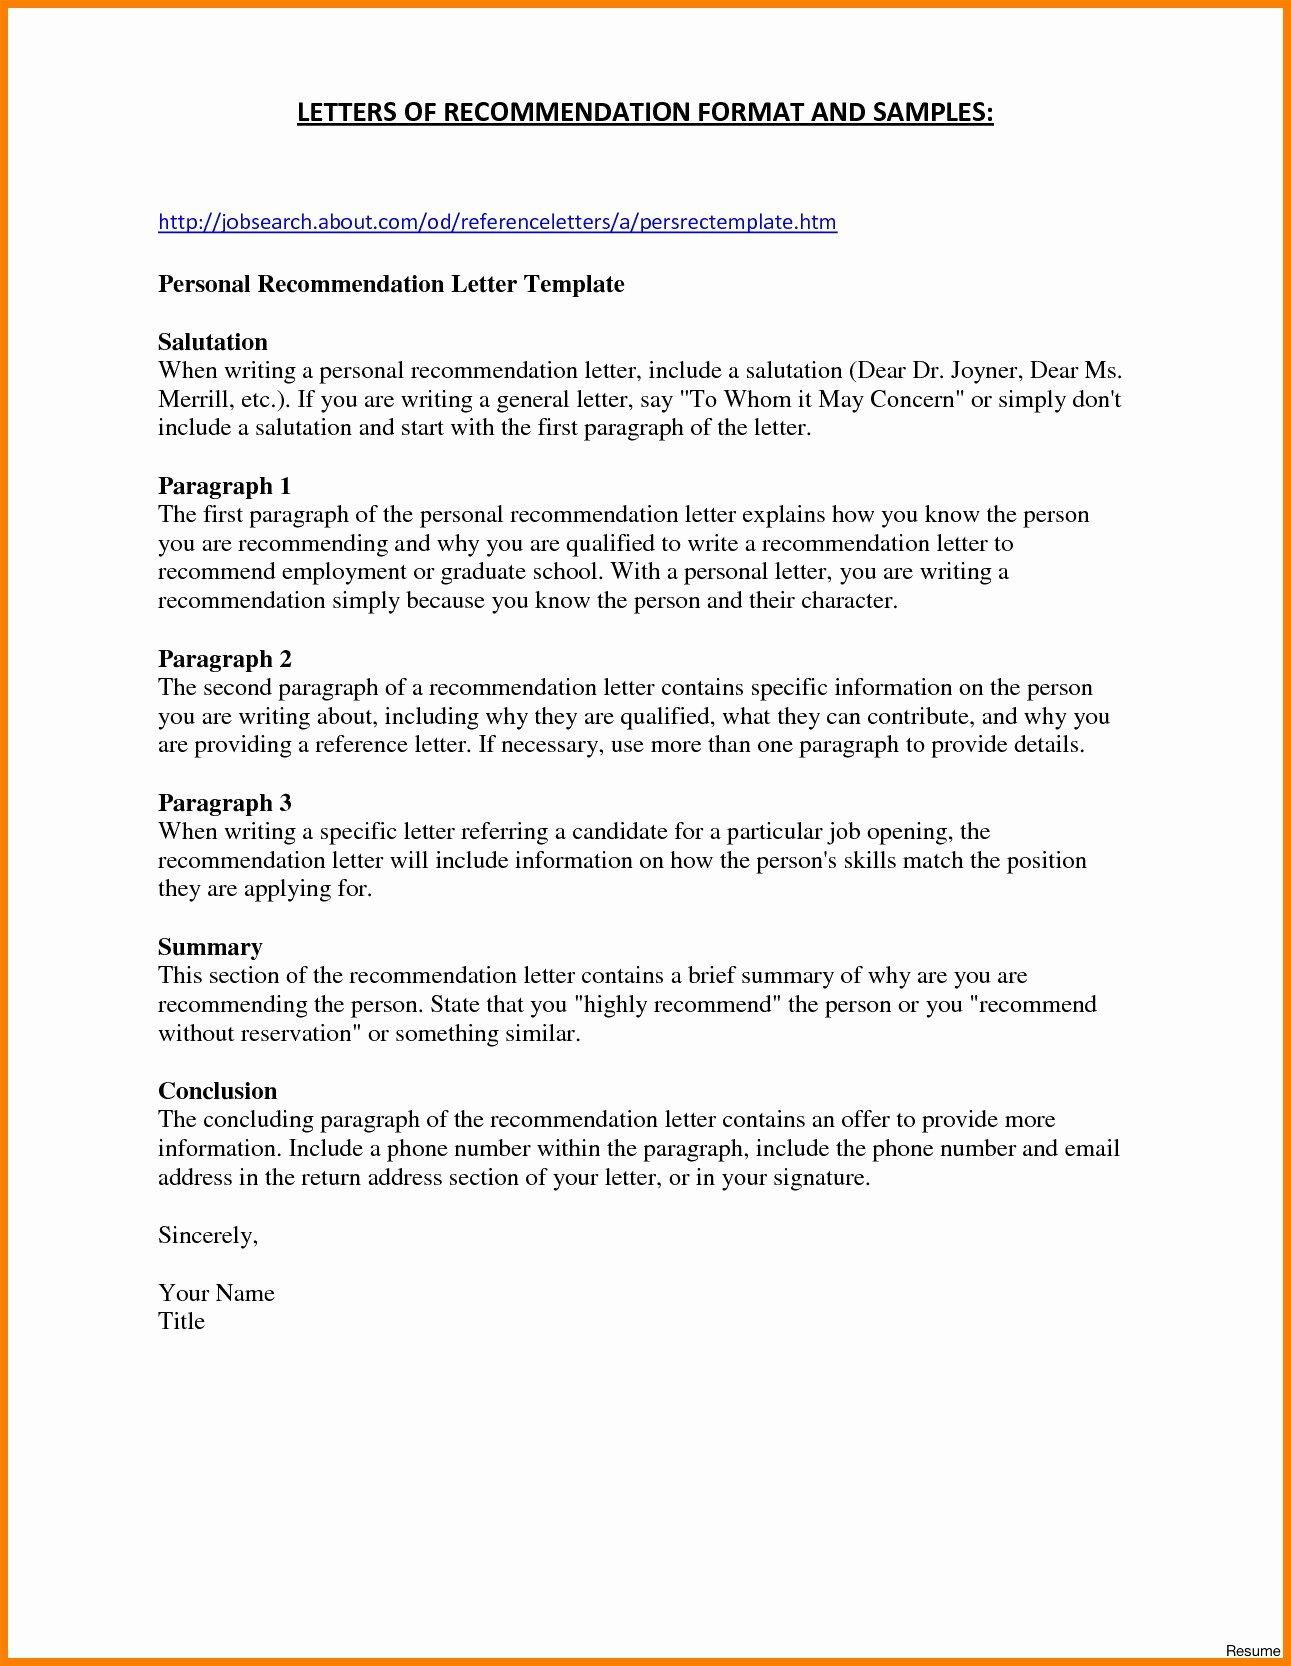 Sample Open Enrollment Letters Fresh Open Enrollment Template Letter Collection